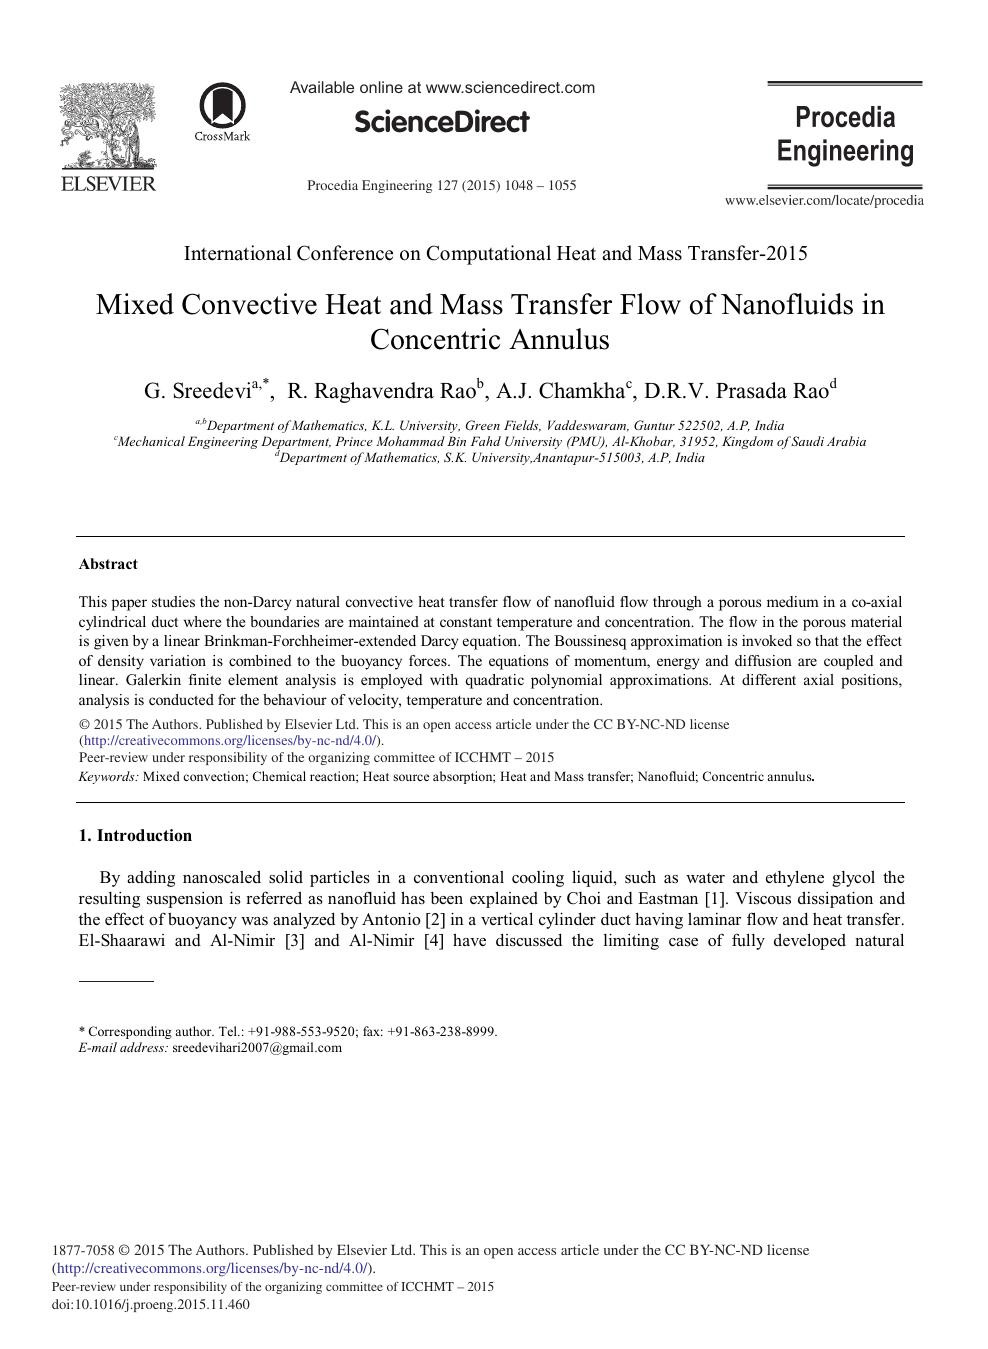 Mixed Convective Heat and Mass Transfer Flow of Nanofluids